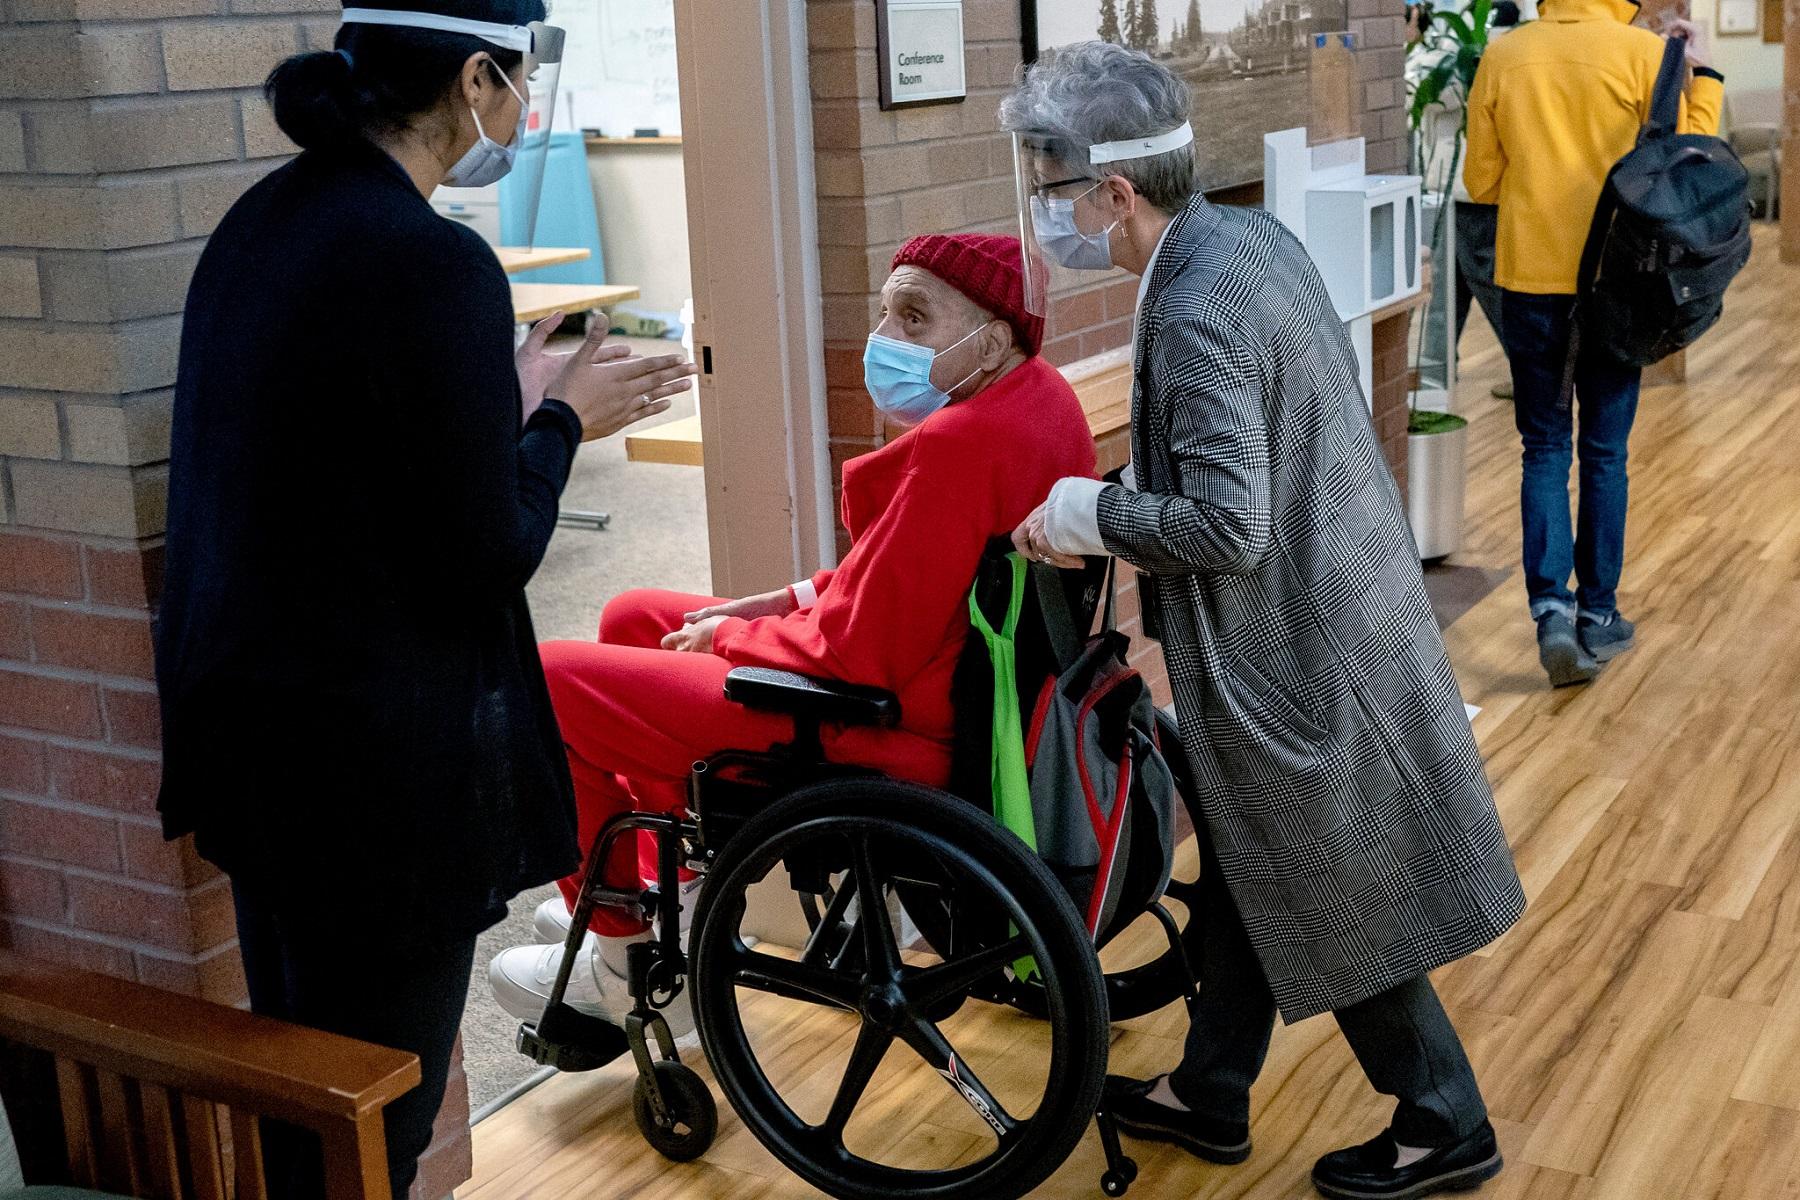 Mελέτη Κορωνοϊός: Tο 25% των επιζώντων covid-19 αναζήτησαν φροντίδα για νέες ιατρικές παθήσεις